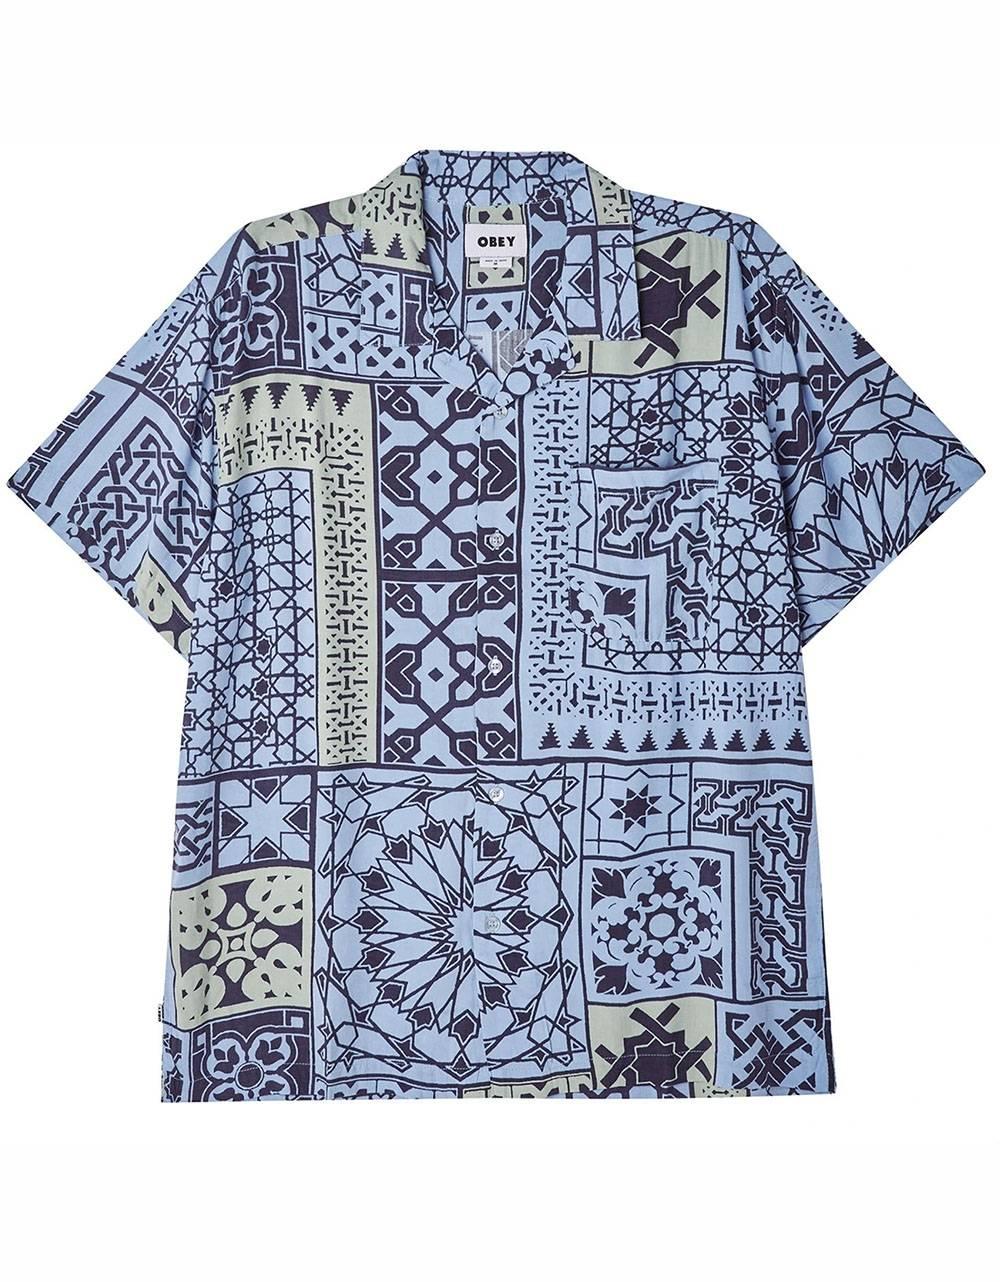 Obey Pathos shirt - navy multi obey Shirt 85,00€